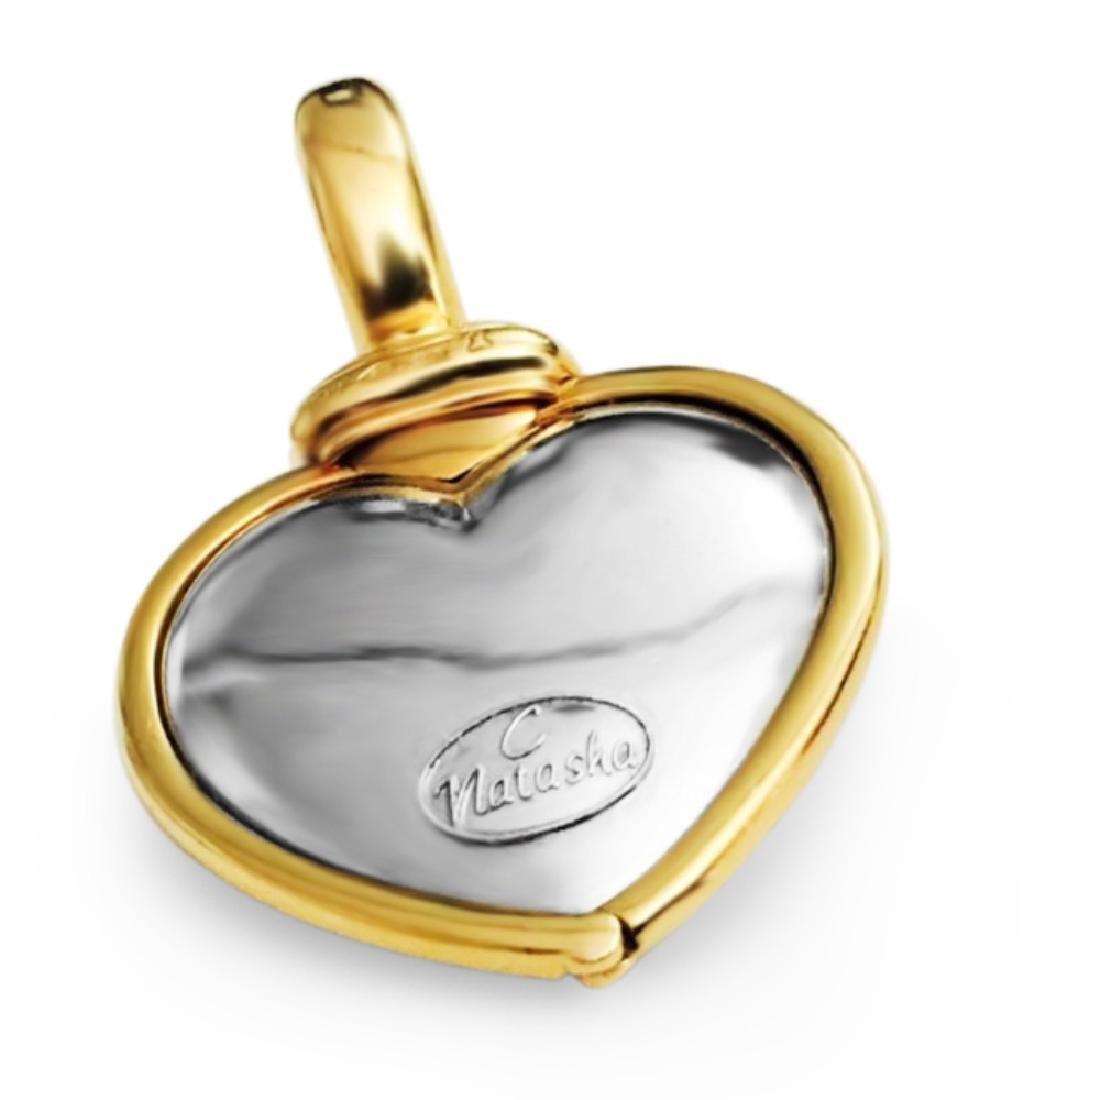 18k Gold Natasha C Diamond Pendant VVS CLARITY DIAMONDS - 3